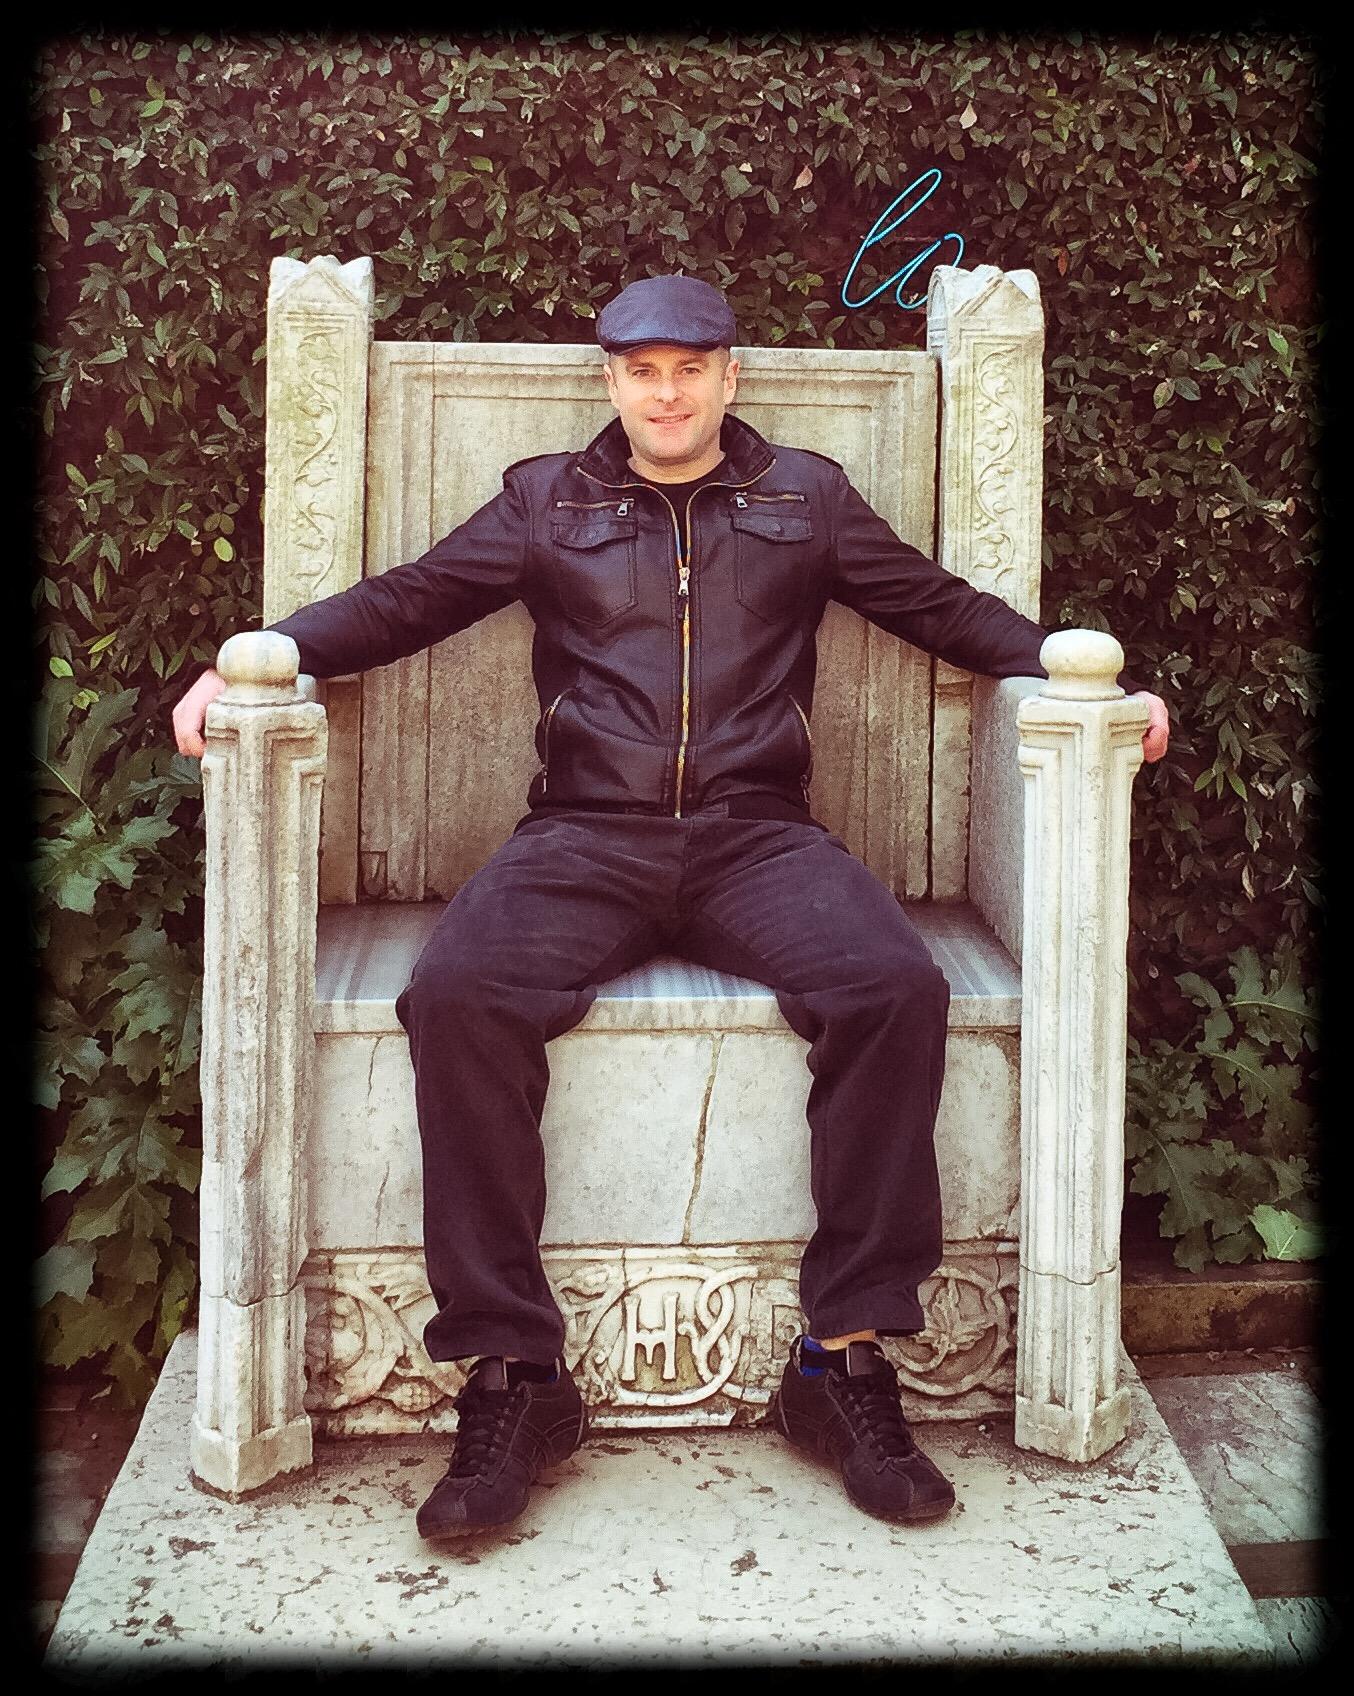 Jesse-Waugh-Peggy-Guggenheim-Throne-Venice.jpg